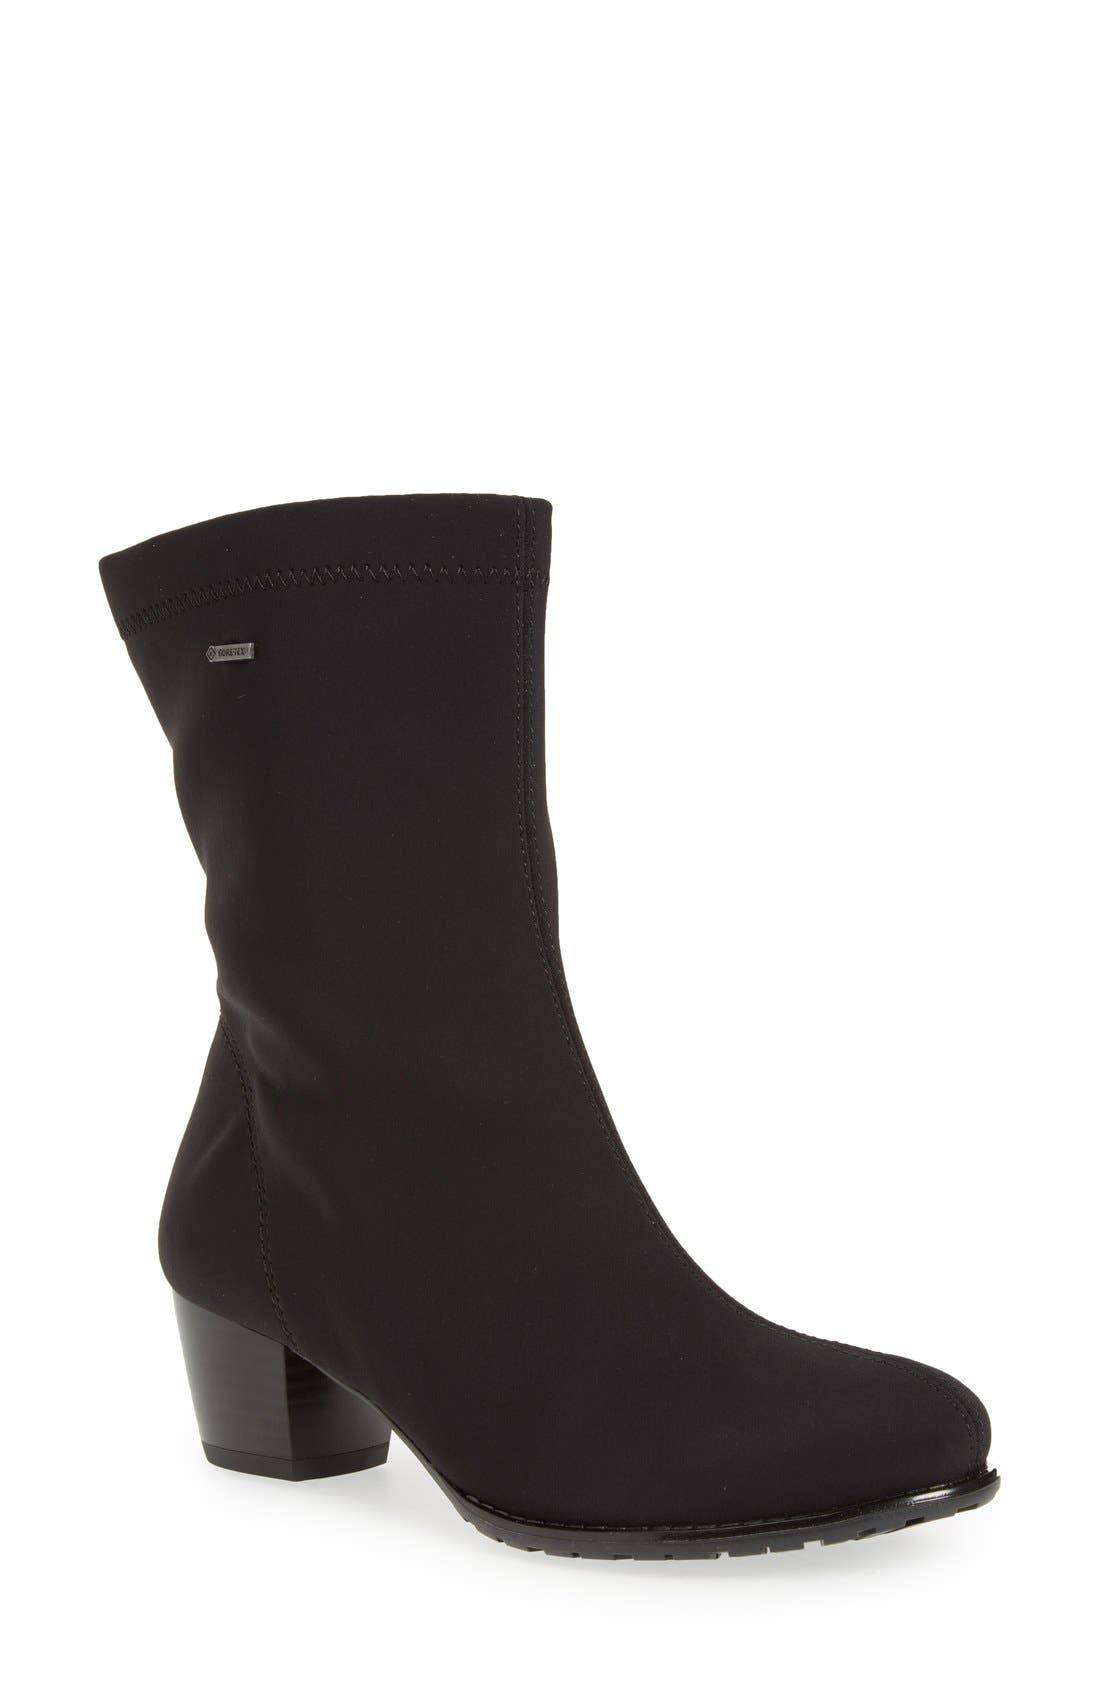 'Fairfax' Waterproof Gore-Tex<sup>®</sup> Block Heel Boot,                             Main thumbnail 1, color,                             Black Fabric